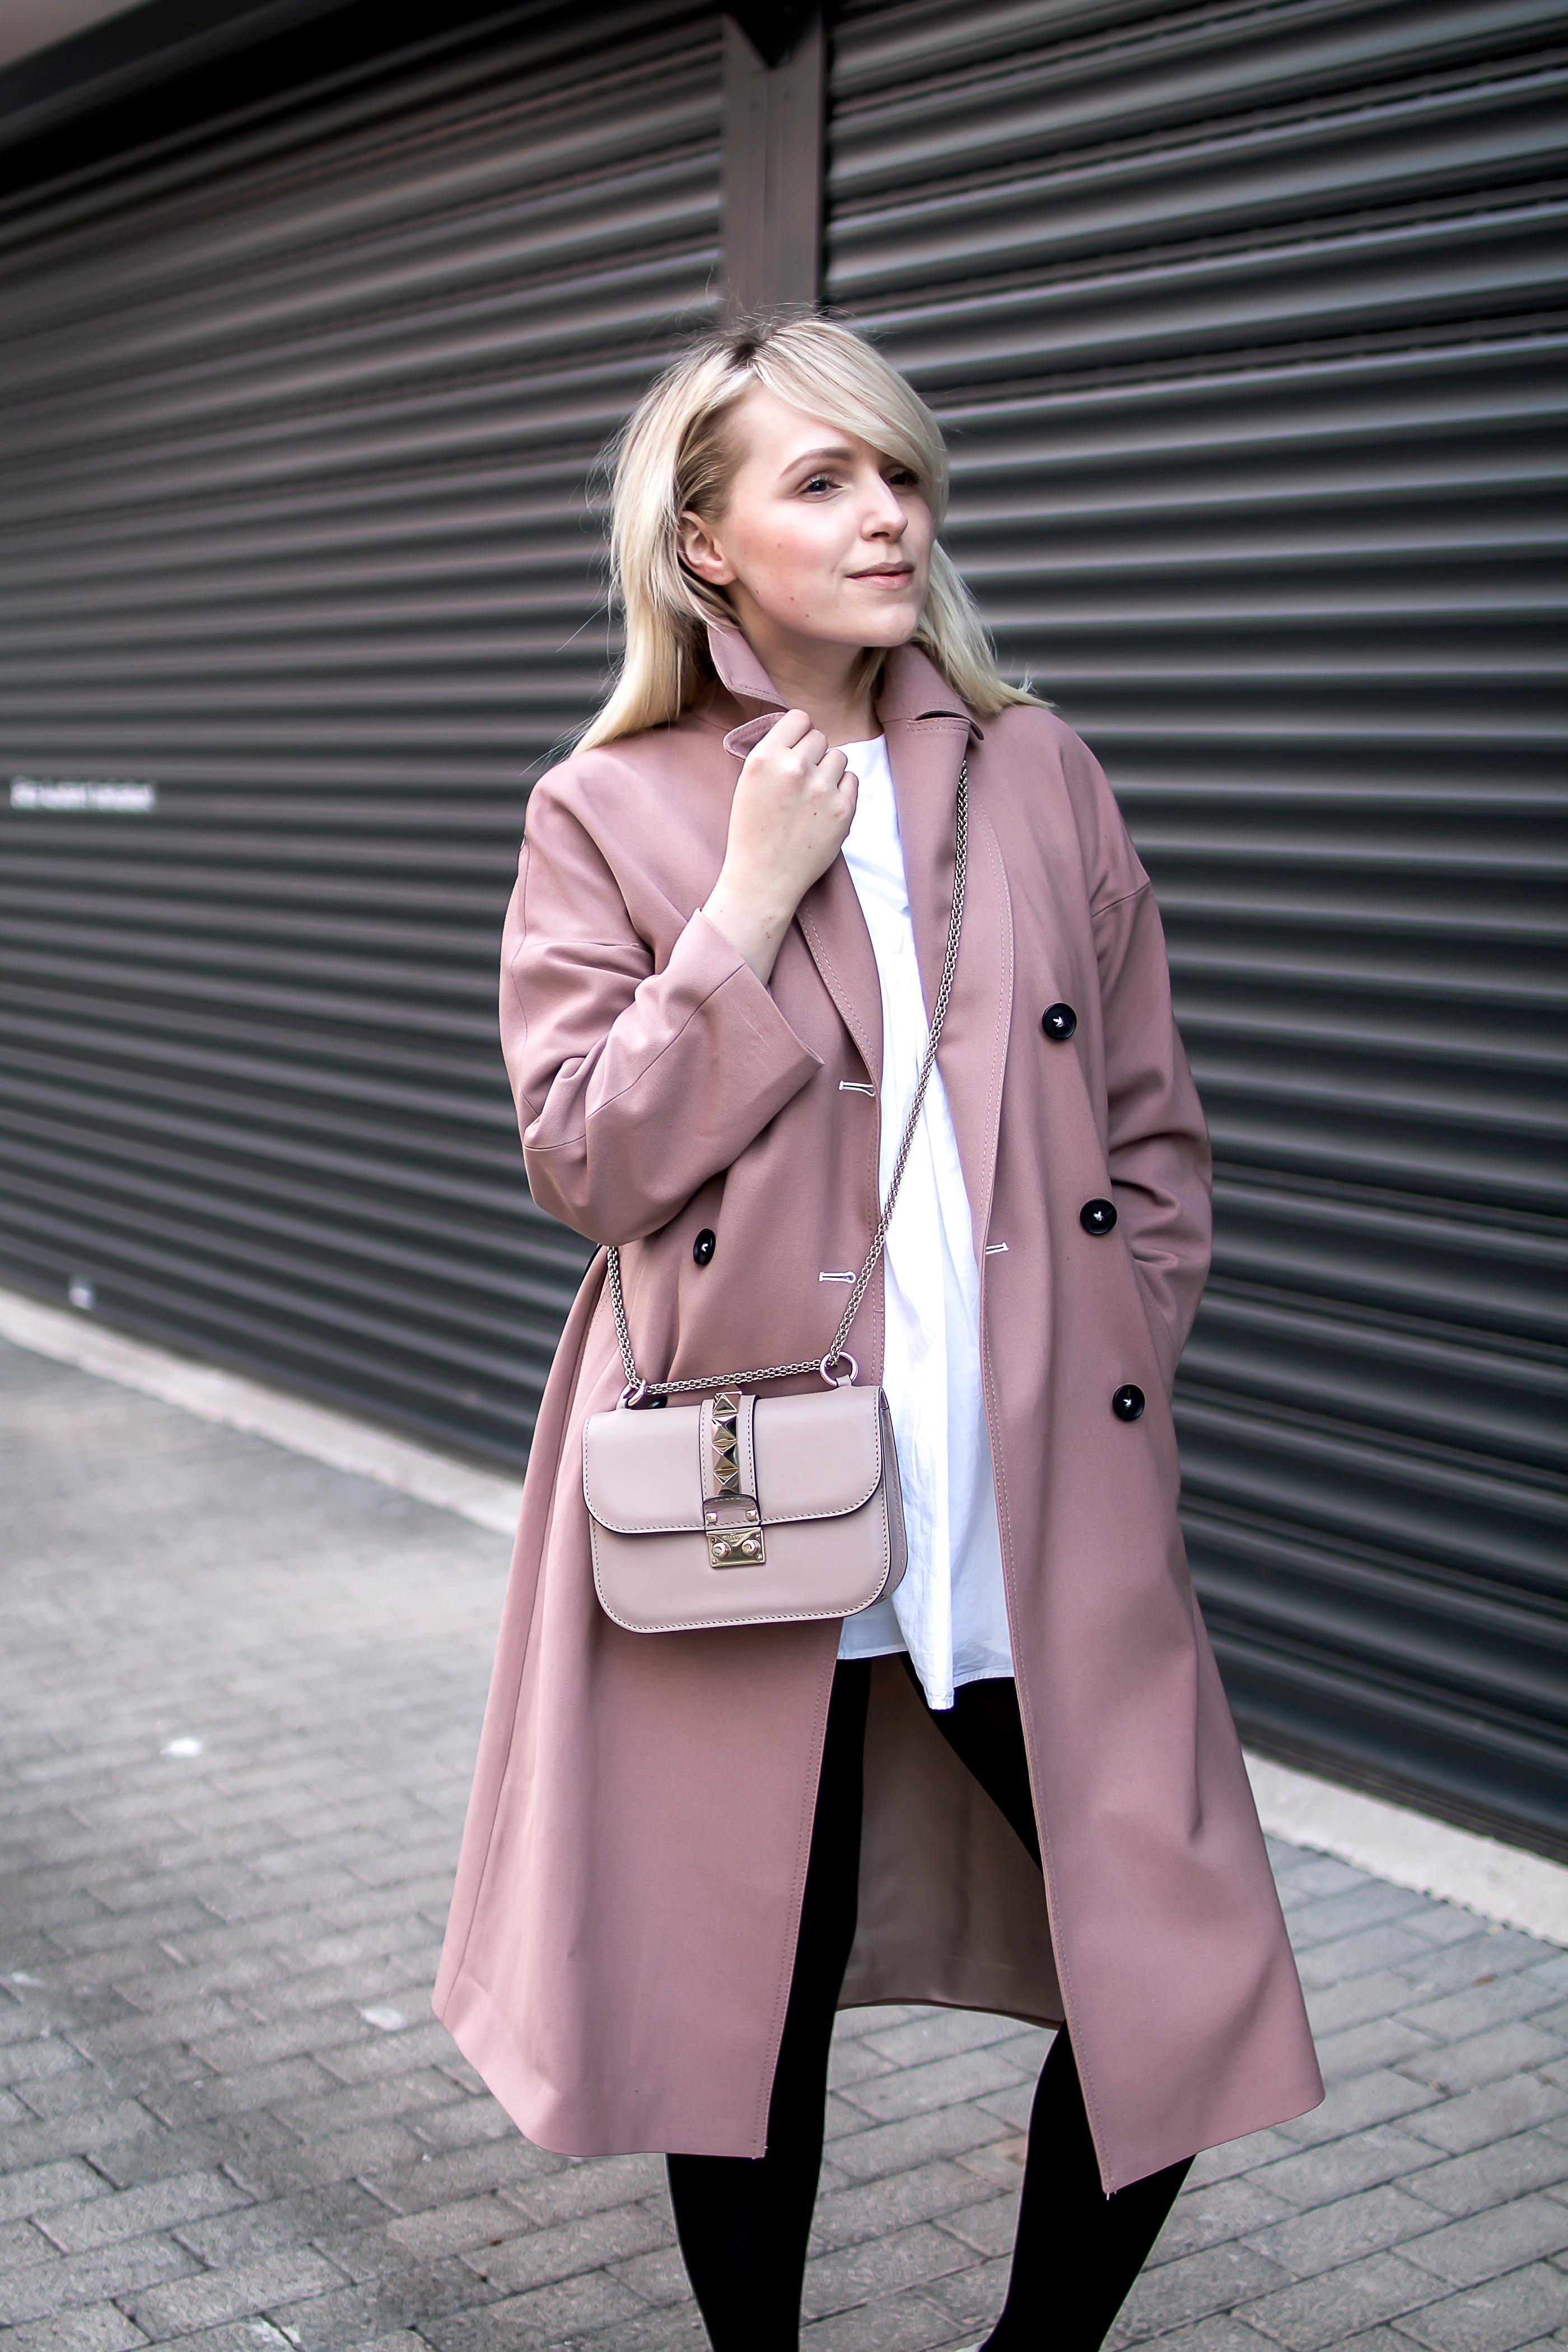 zara rosa Trenchcoat Trend Modeblogger Klischee blogger